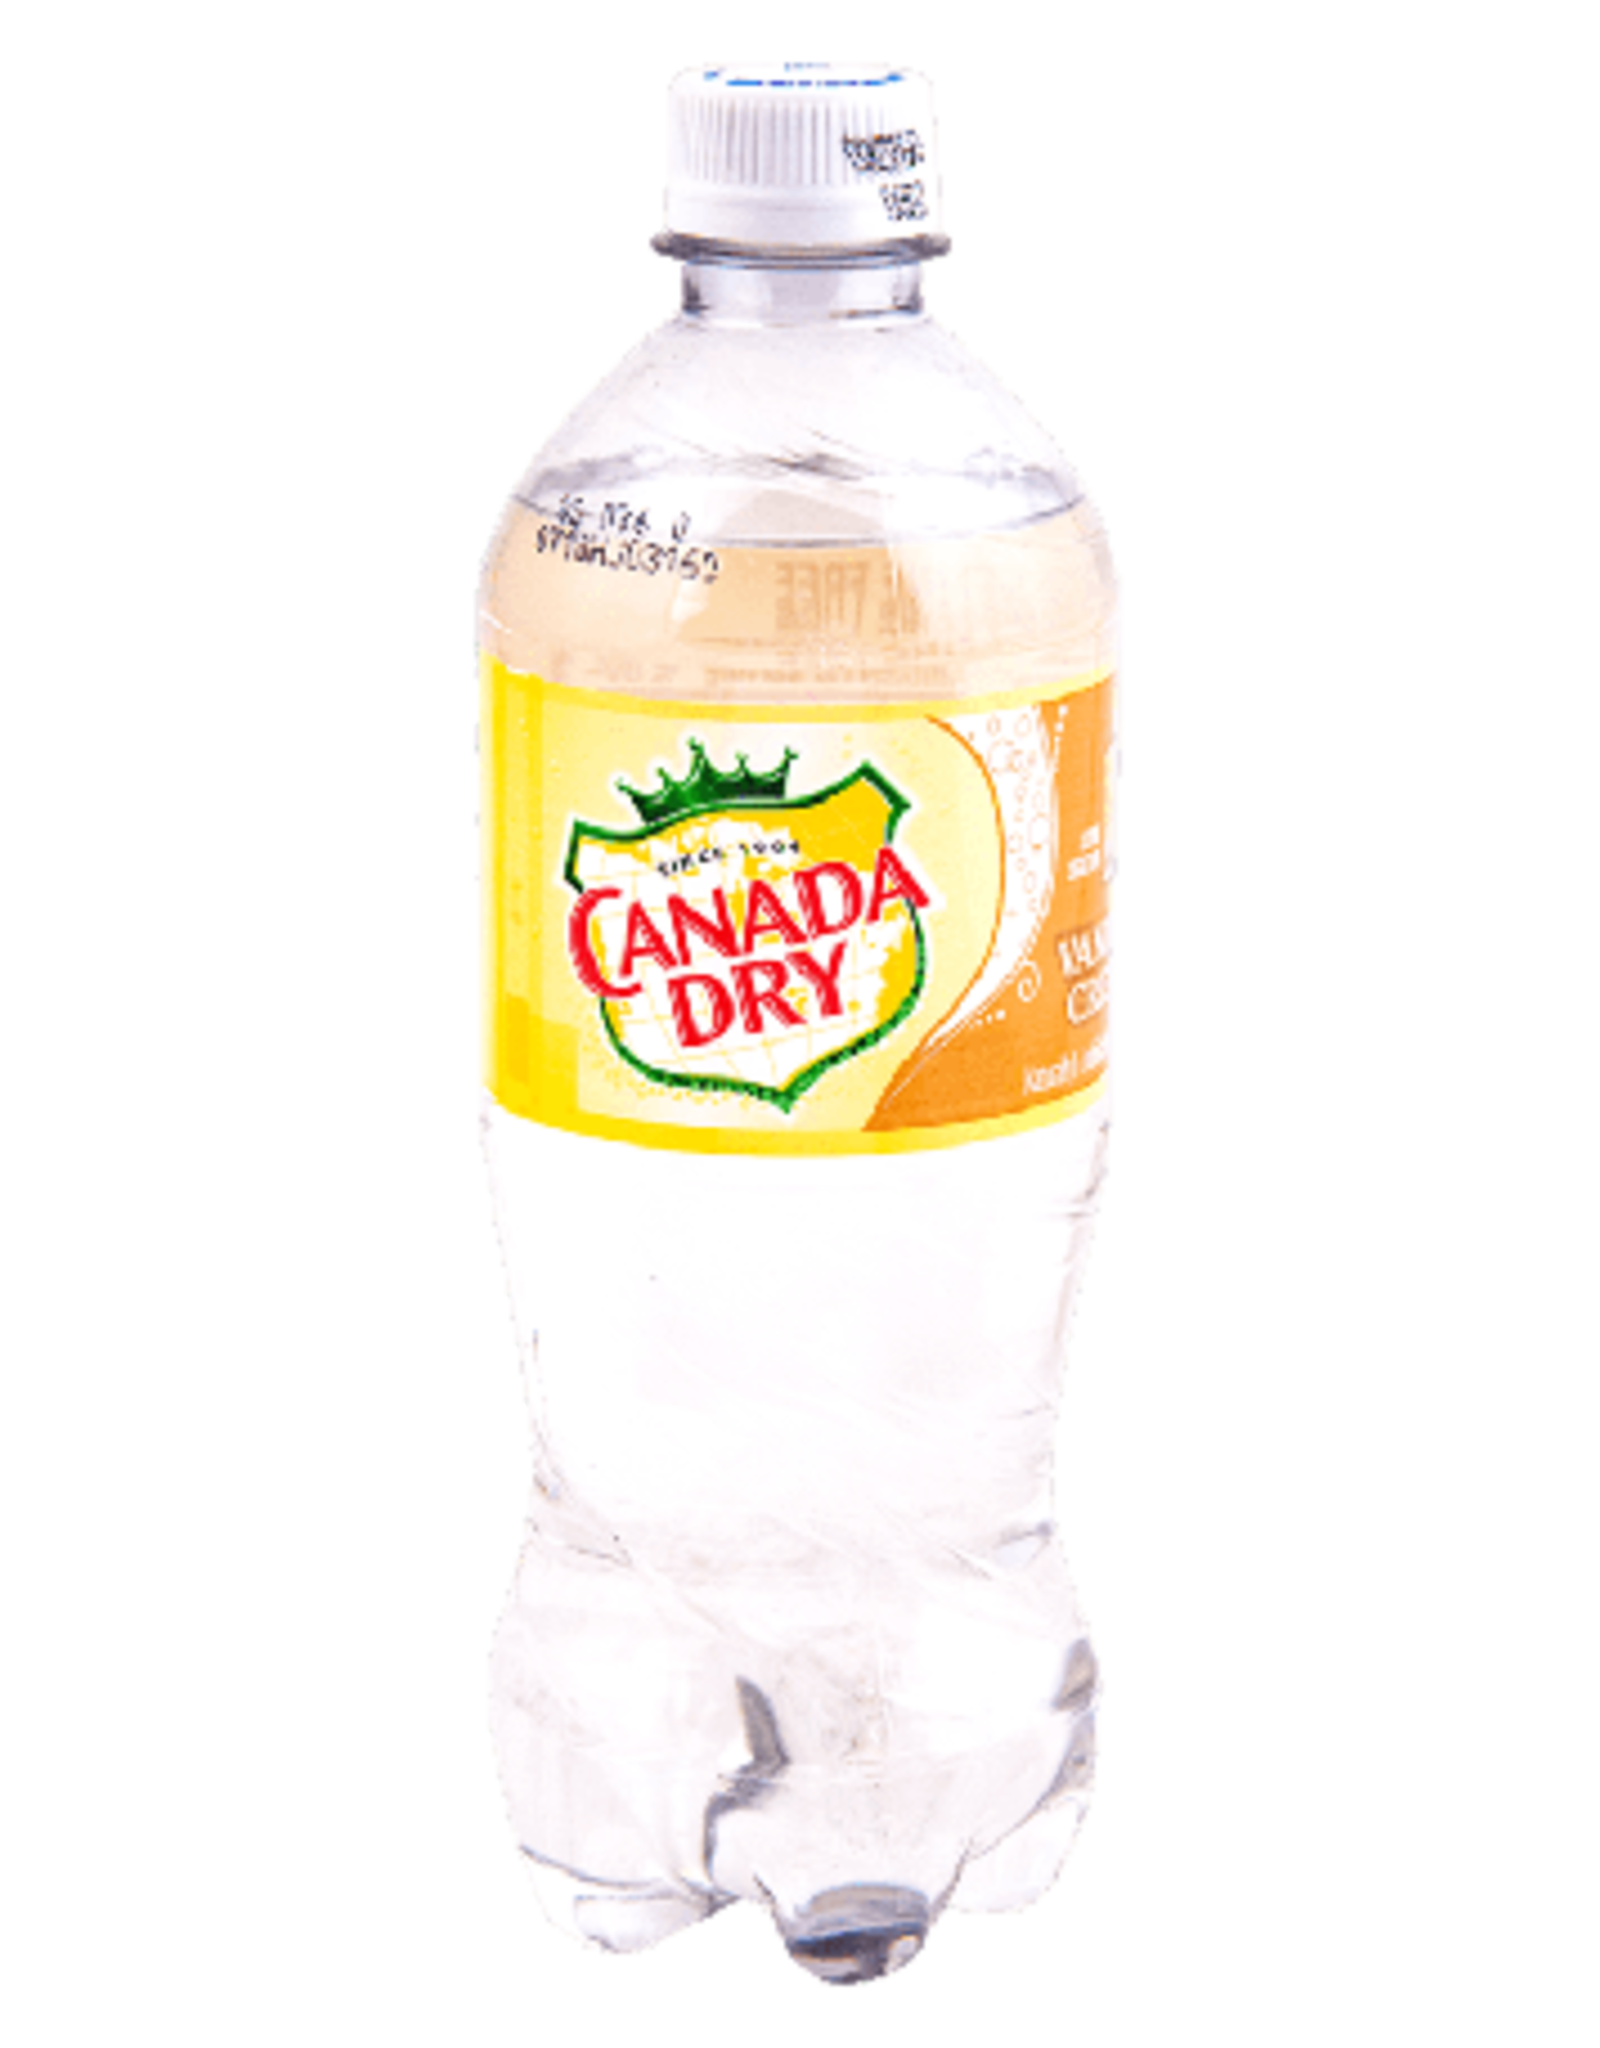 stockupmarket Canada Dry Vanilla Cream Soda